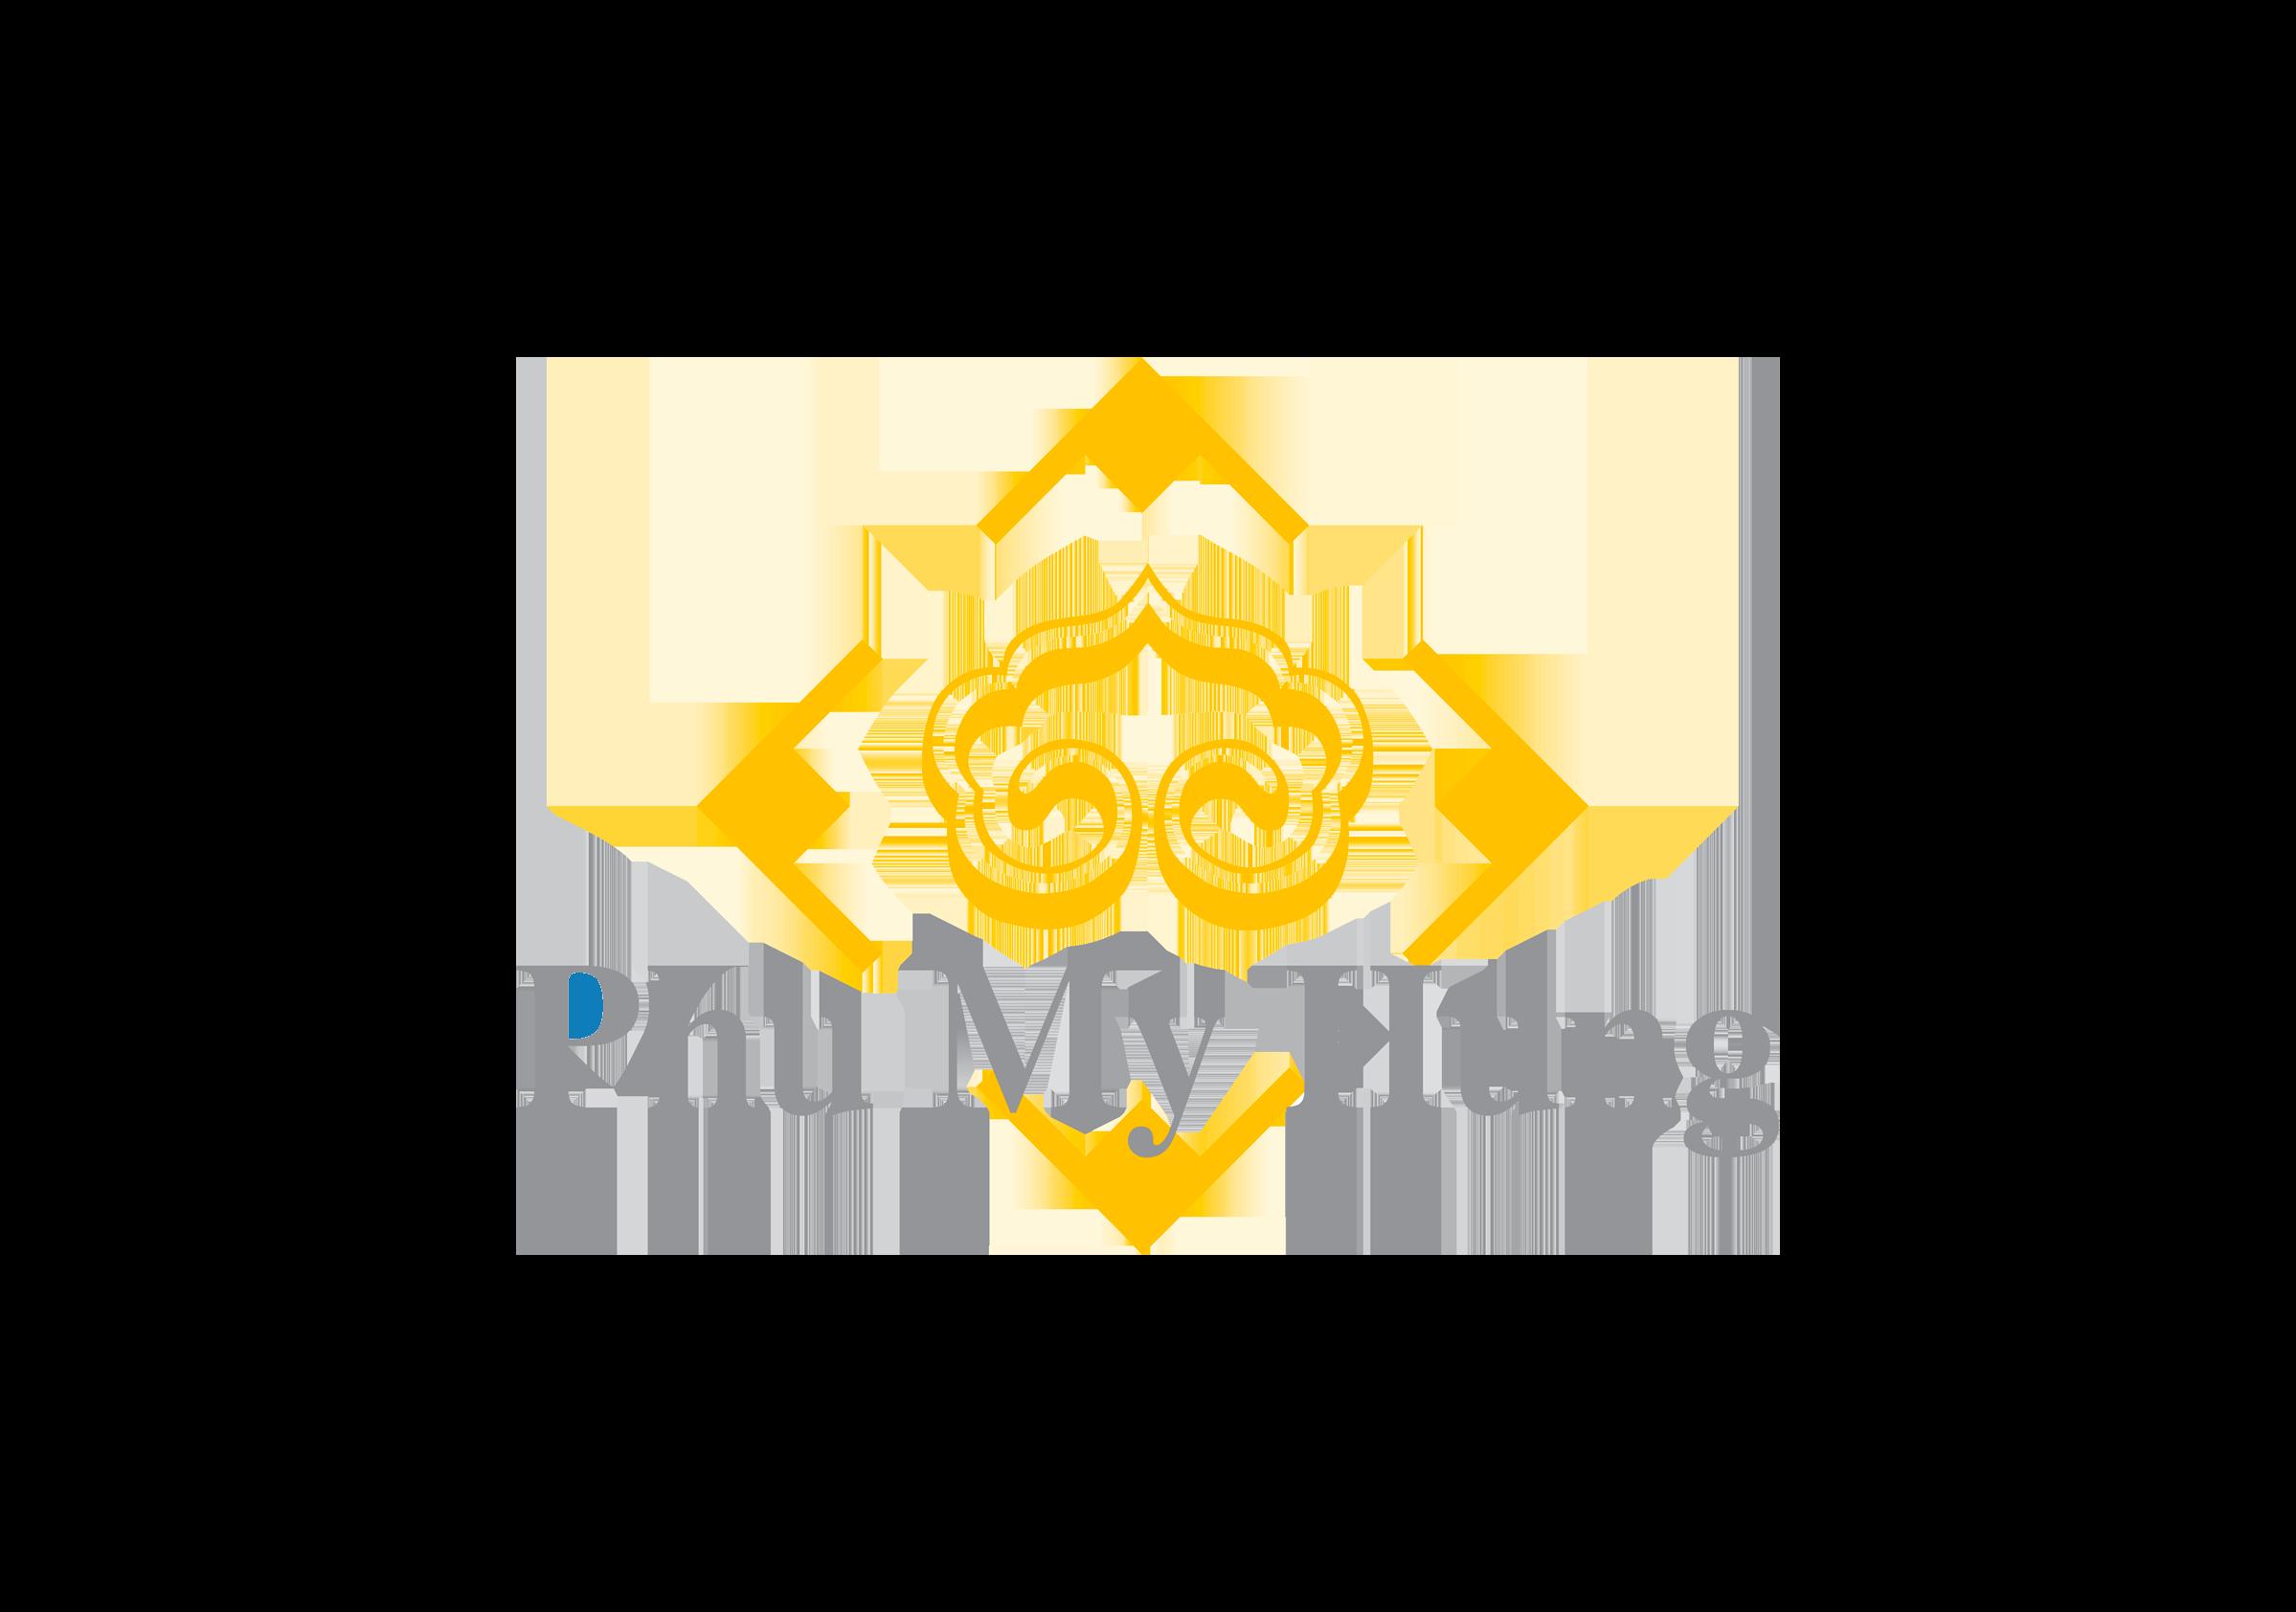 Phu My hung logo vector